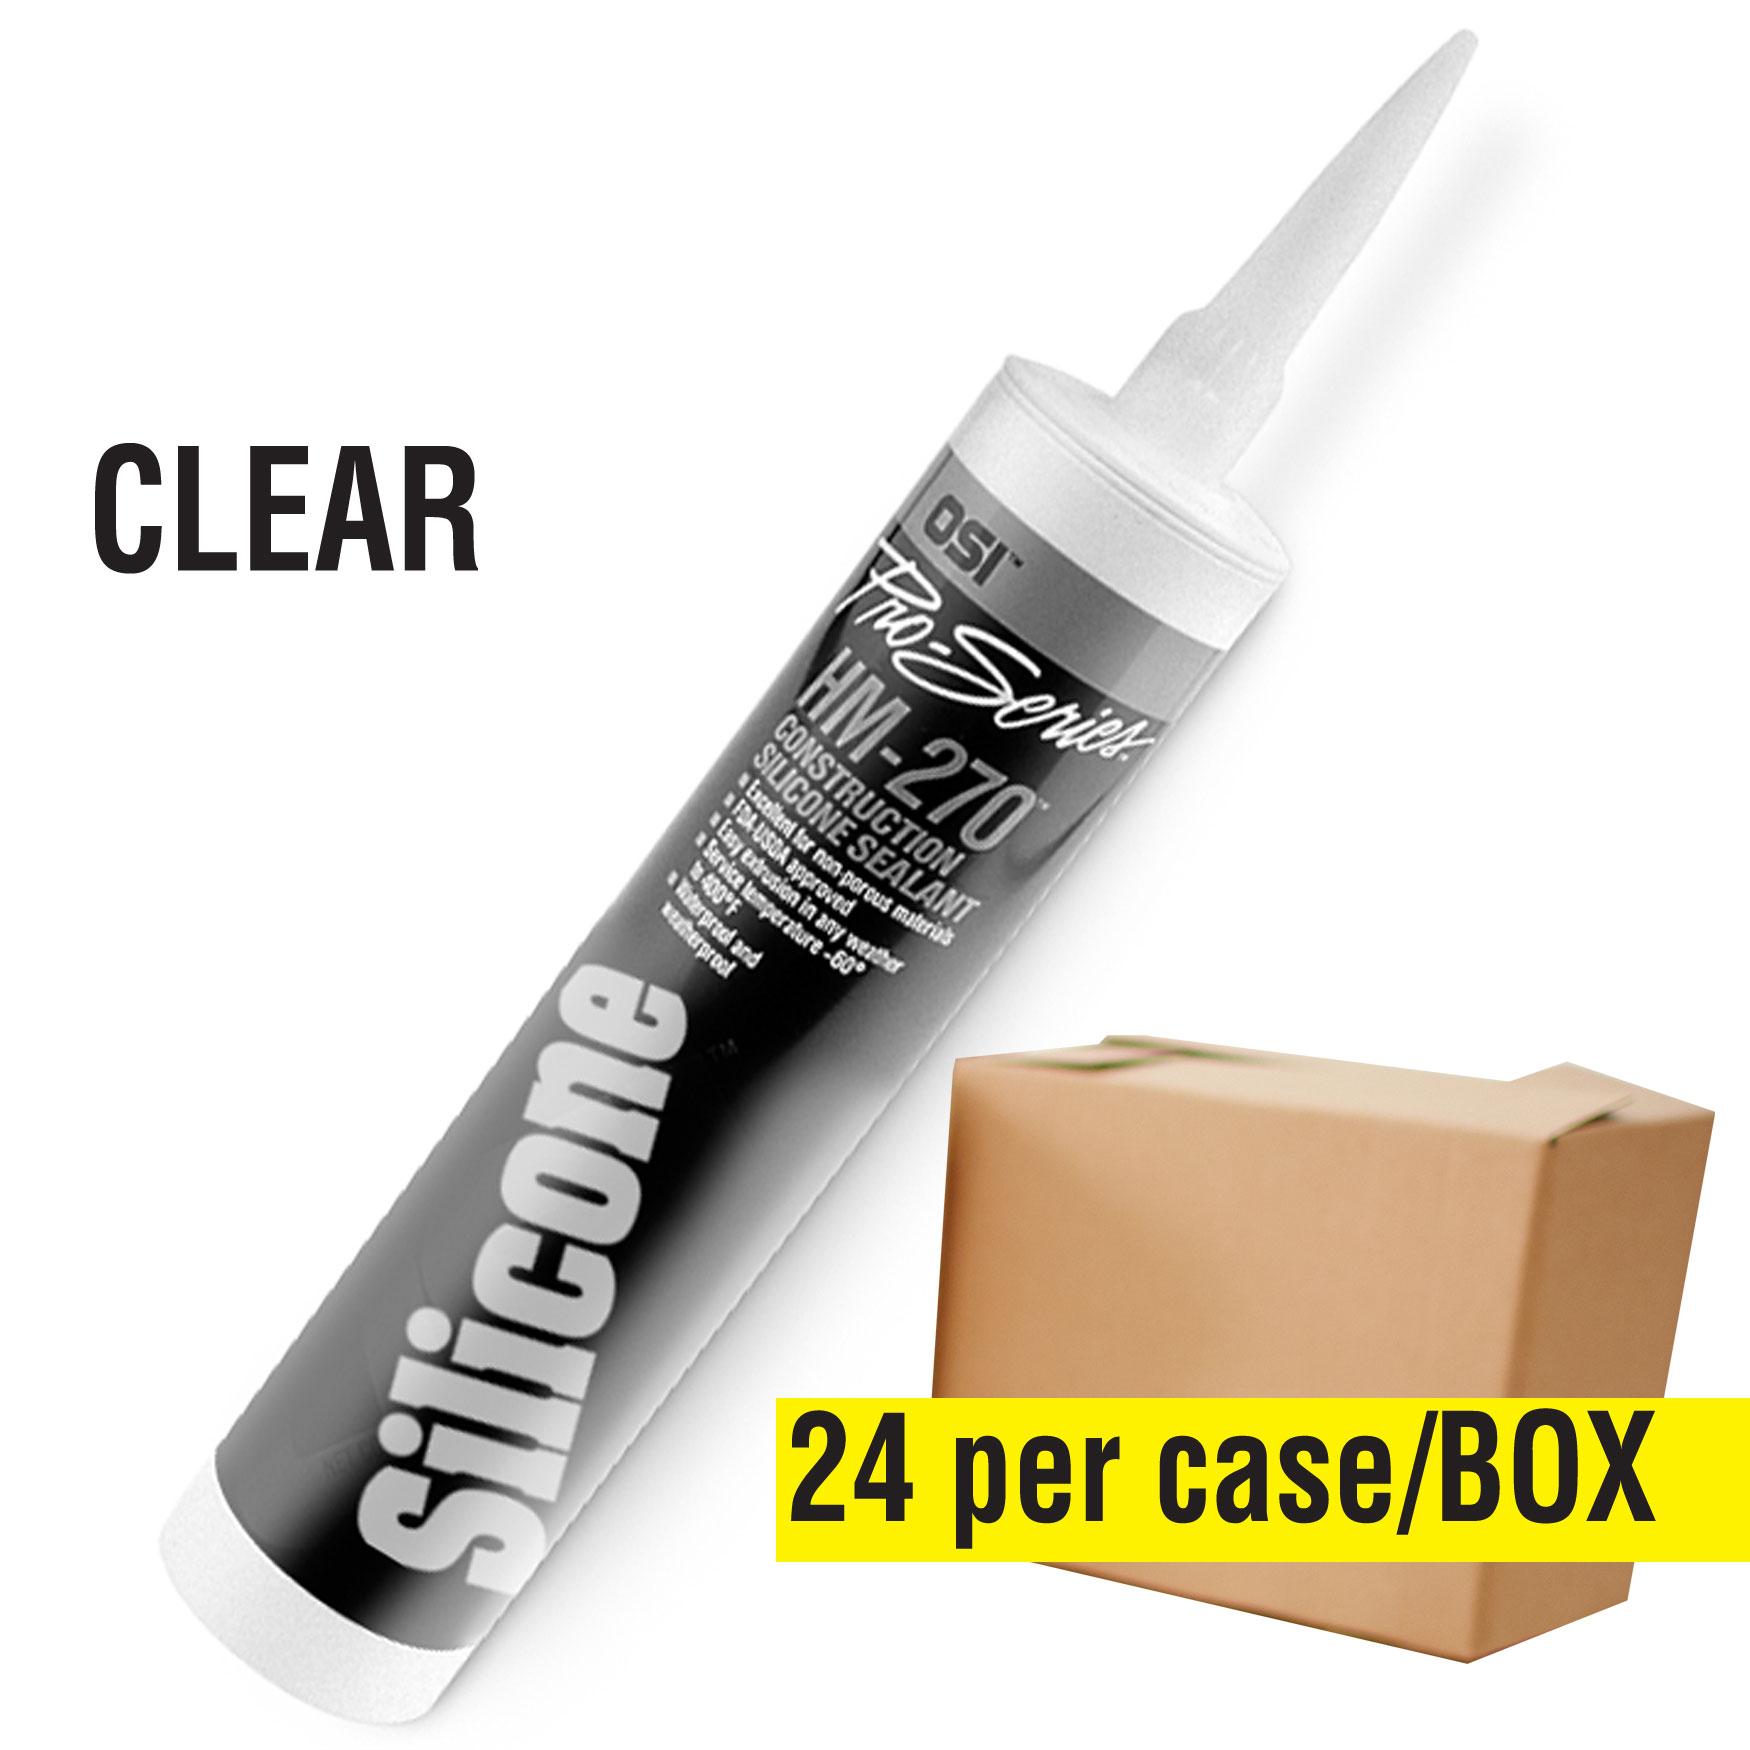 Silicone Sealant - Clear